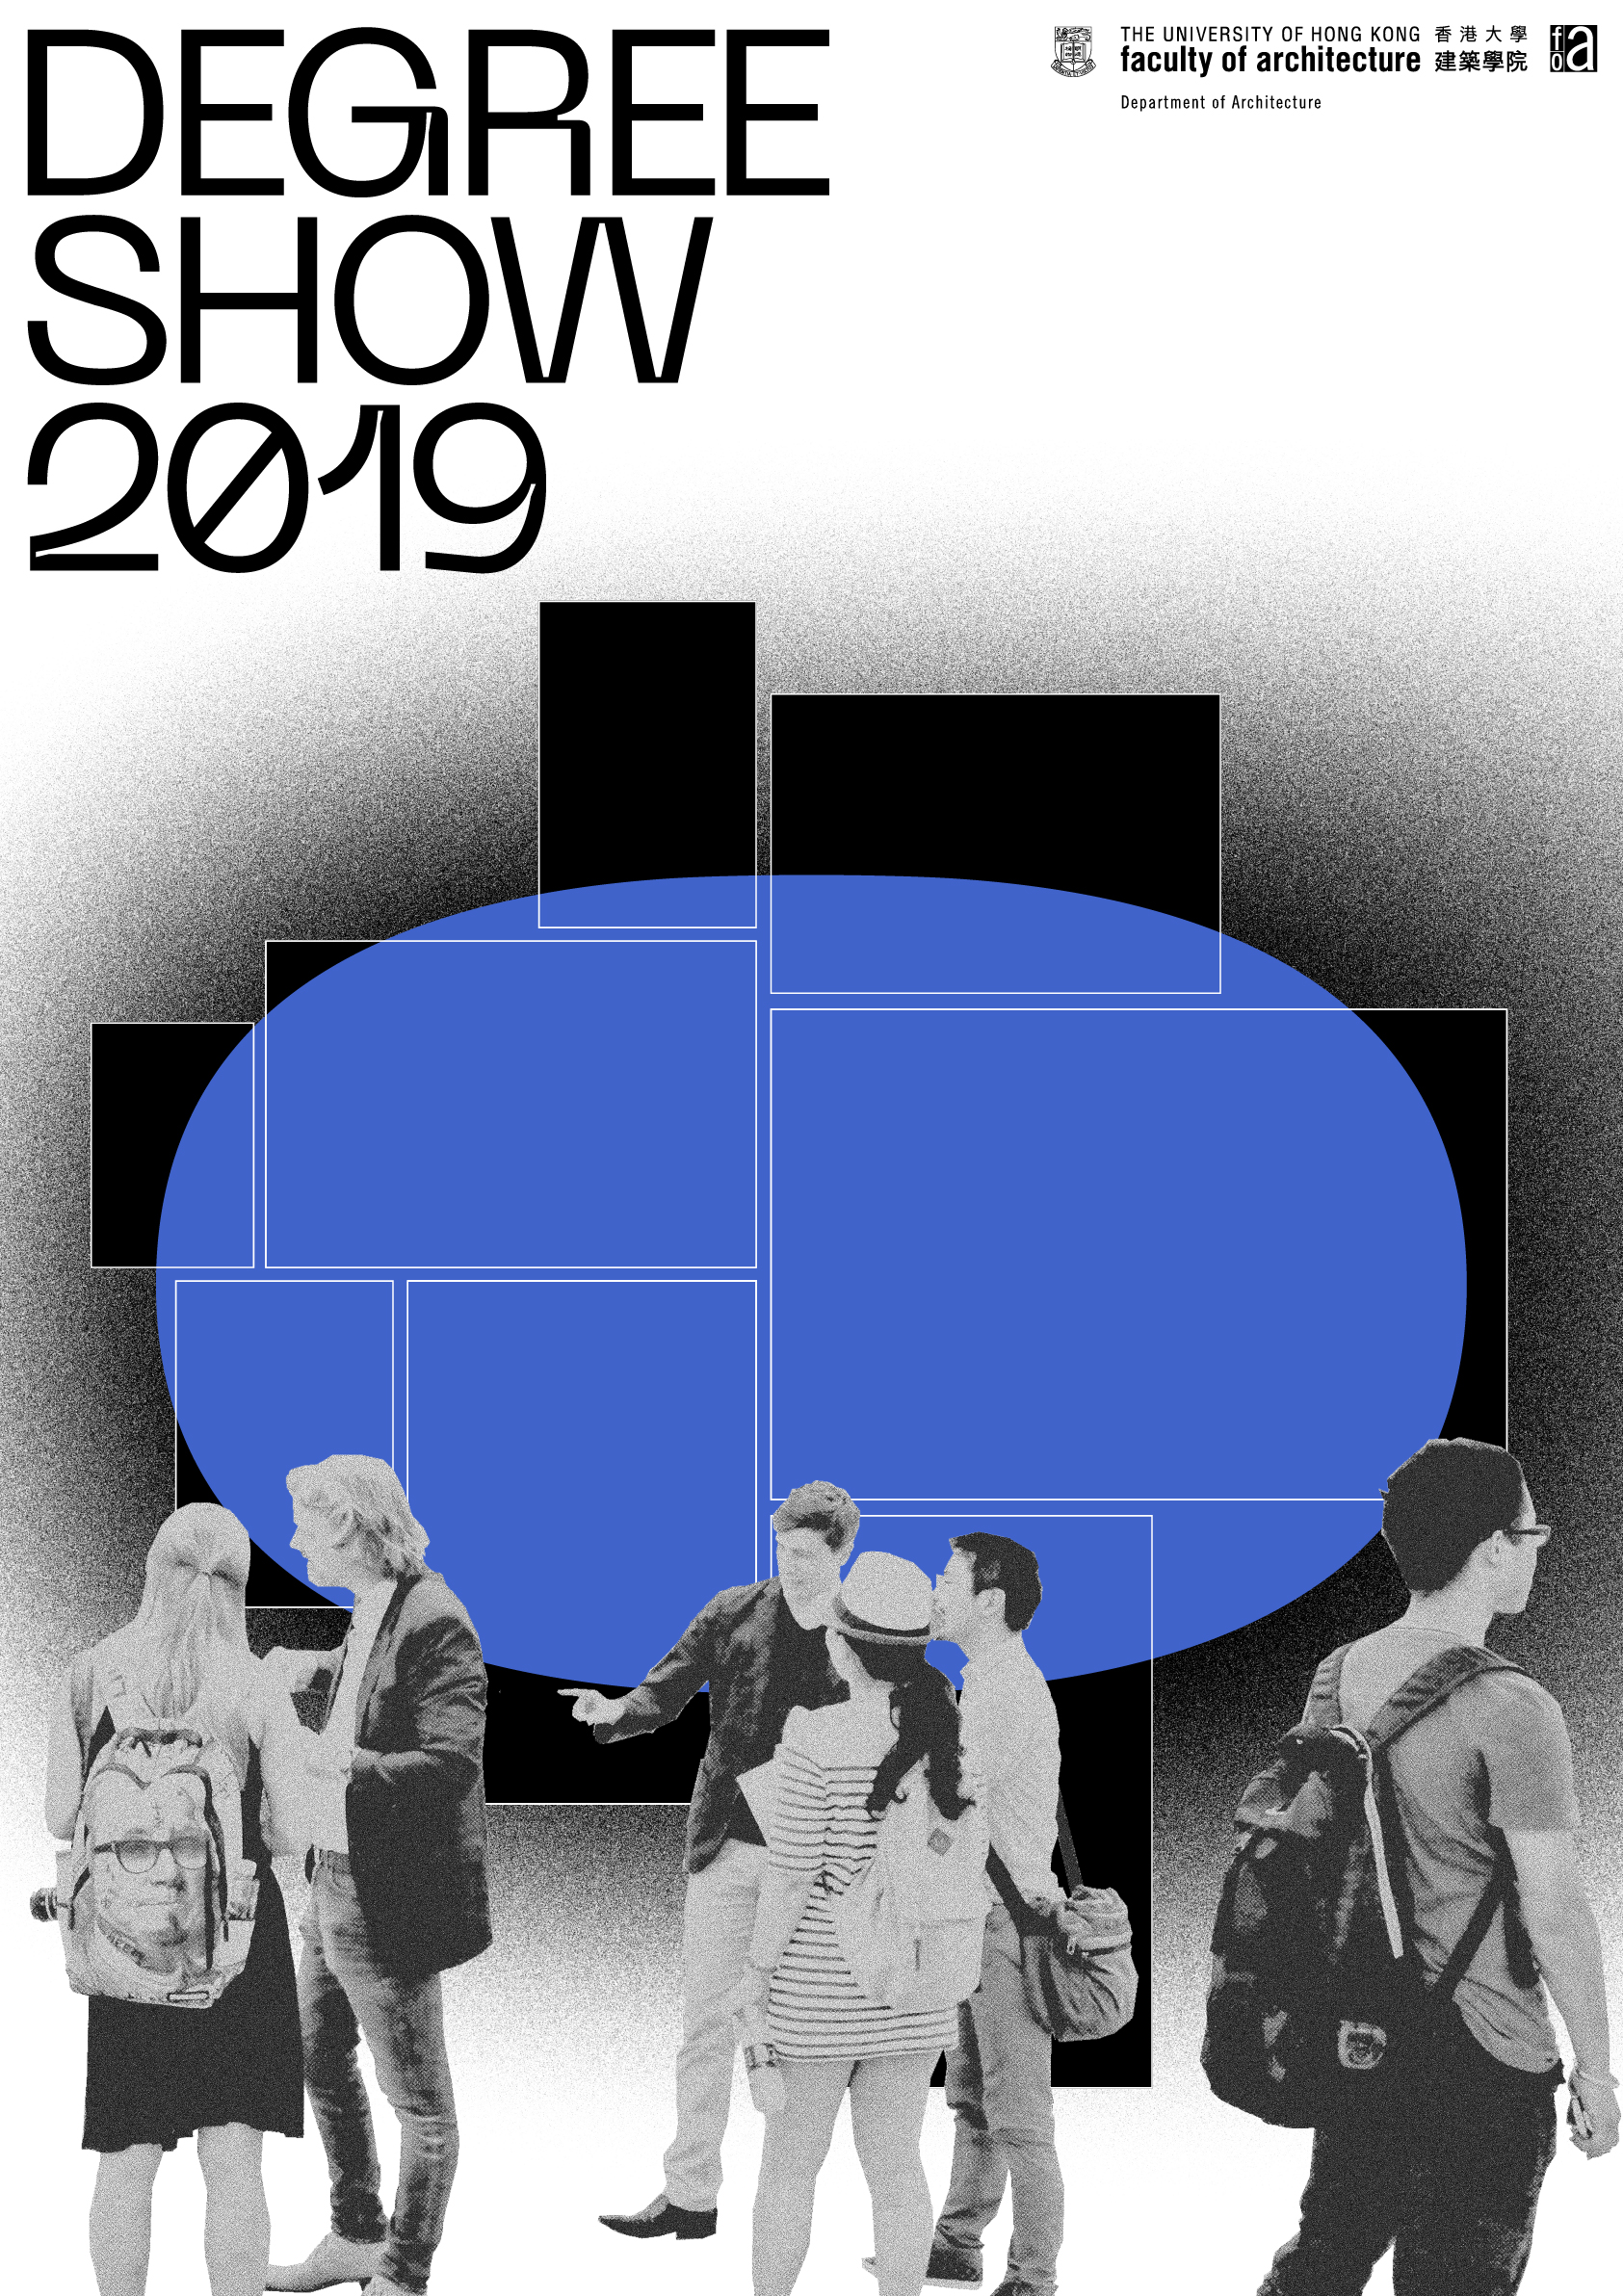 Degree Show 2019